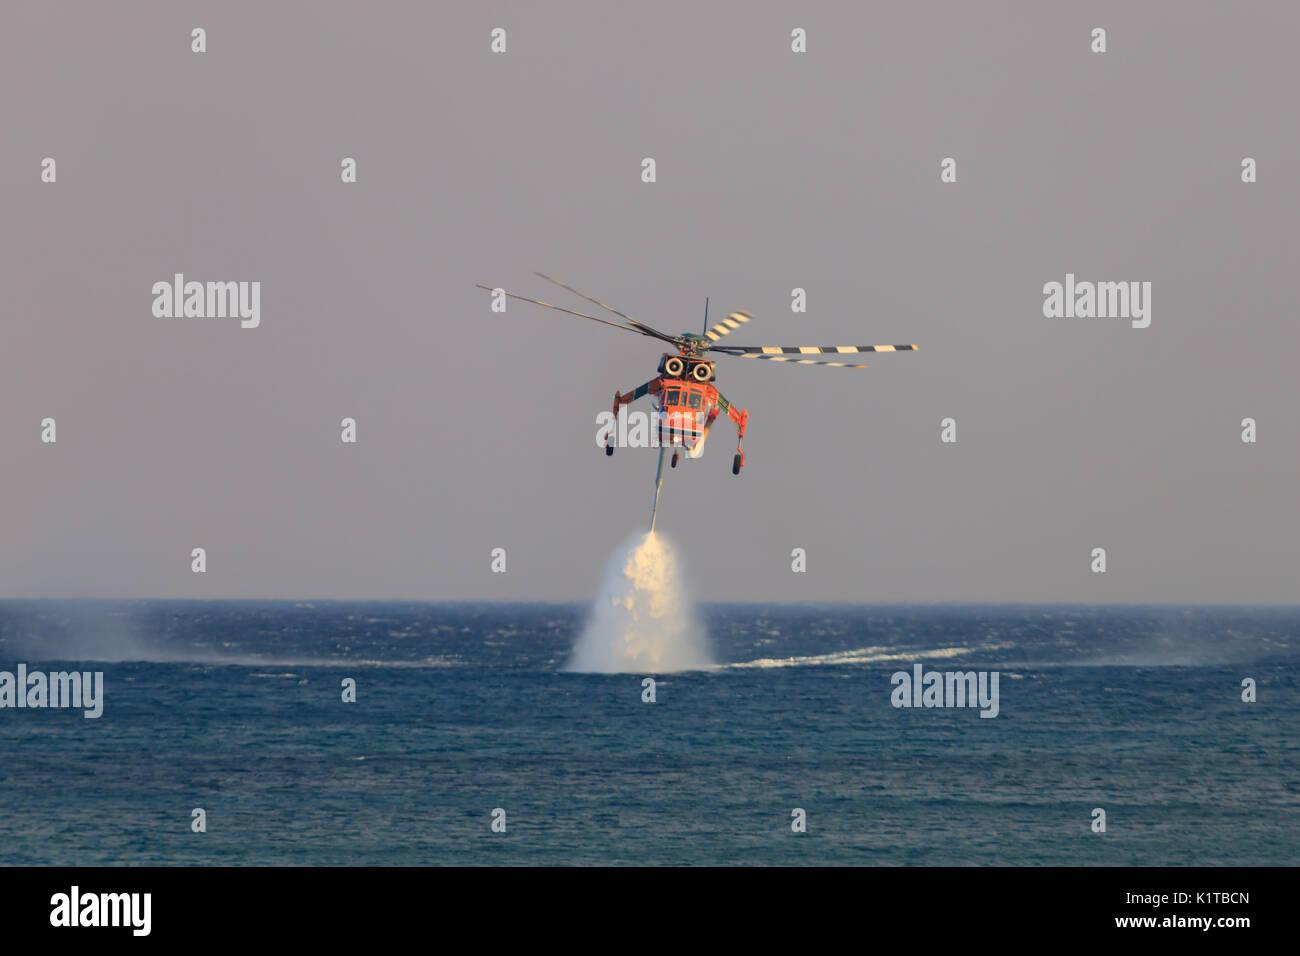 Zakynthos/Greece August 12, 2017: sikorsky s-64e skycrane, fighting against fire at Zakynthos. - Stock Image